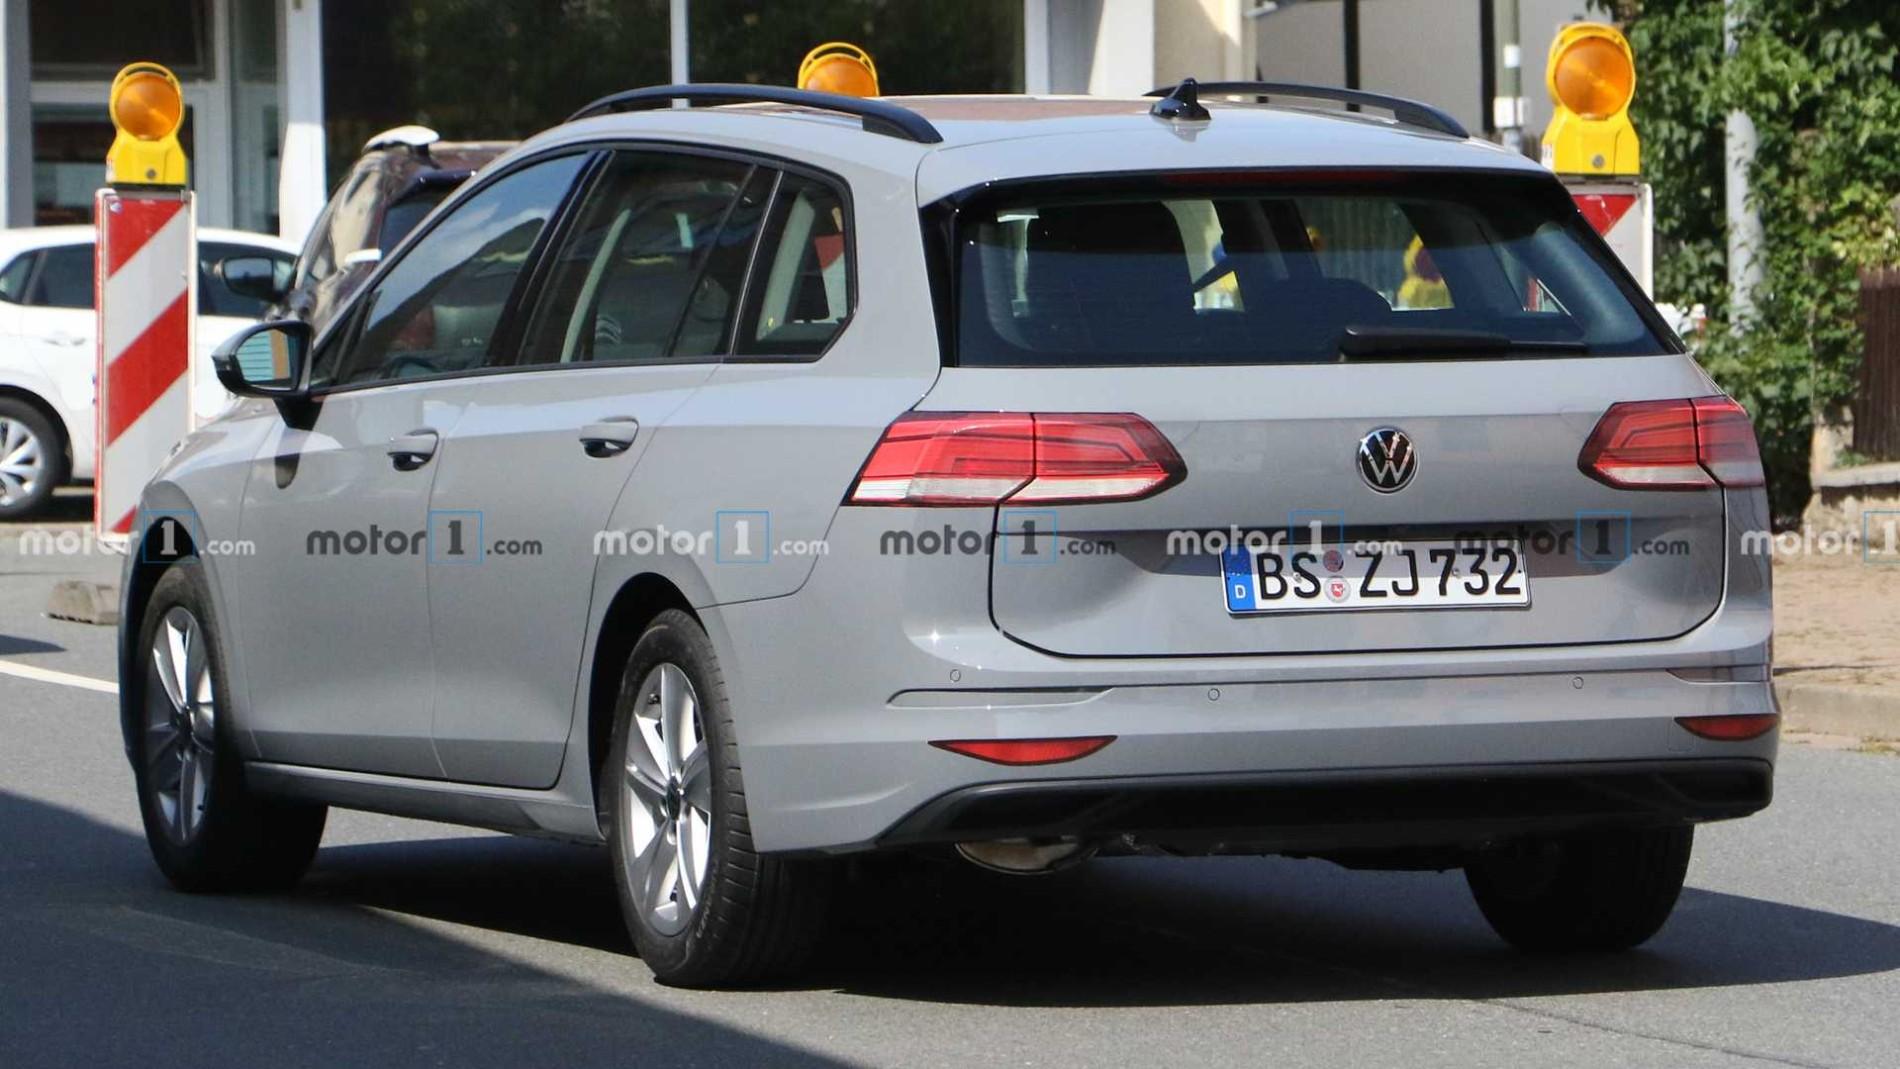 Volkswagen Golf 8 Variant - Volkswagen Golf 8 Variant